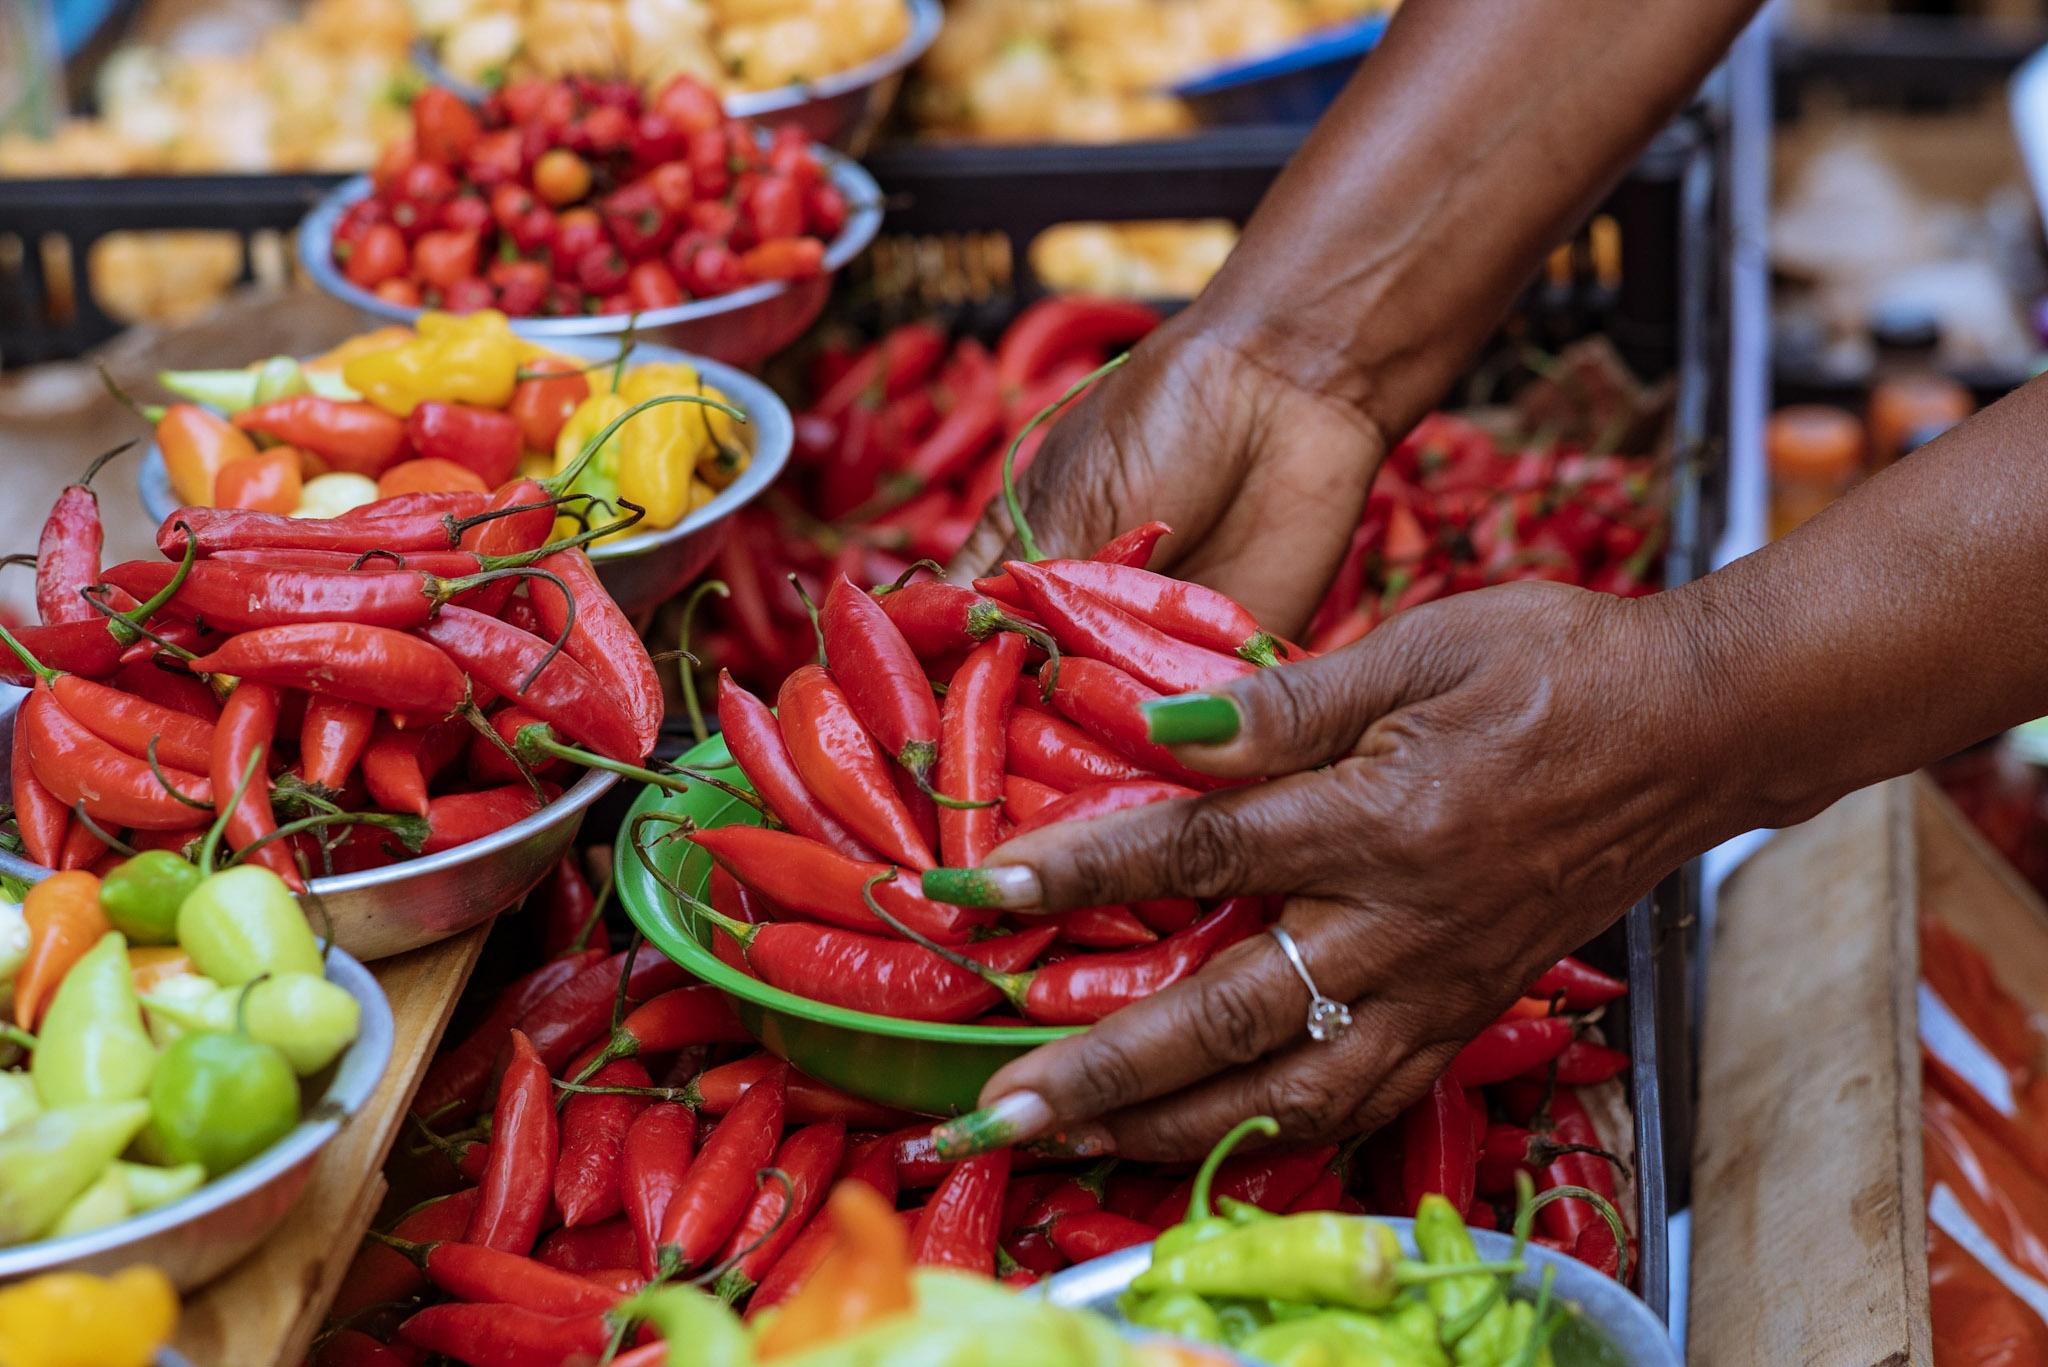 mercadora arruma pimenta e outras mercadorias no mercado da Vila Rubim